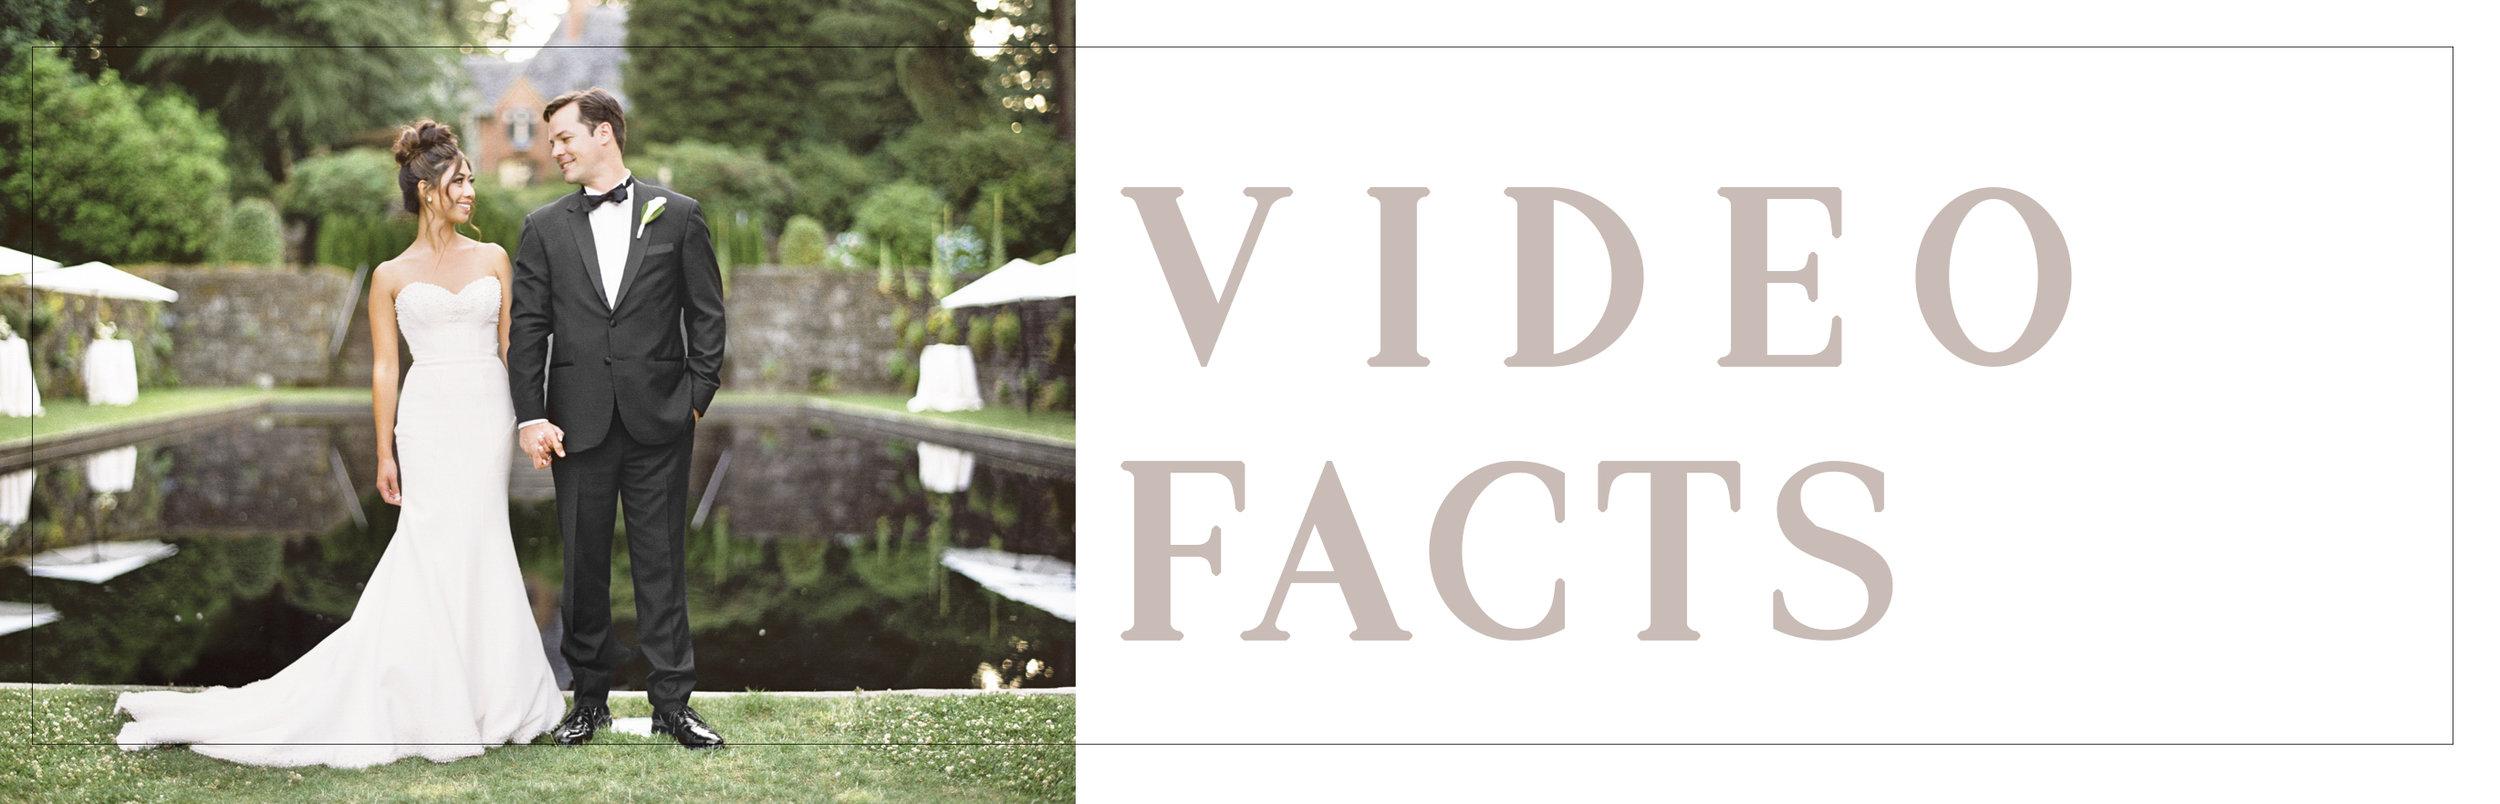 VIDEO_FACTSlos_angeles_san_francisco_wedding_photo_and_video_company_VIDEO FAQ copy.jpg